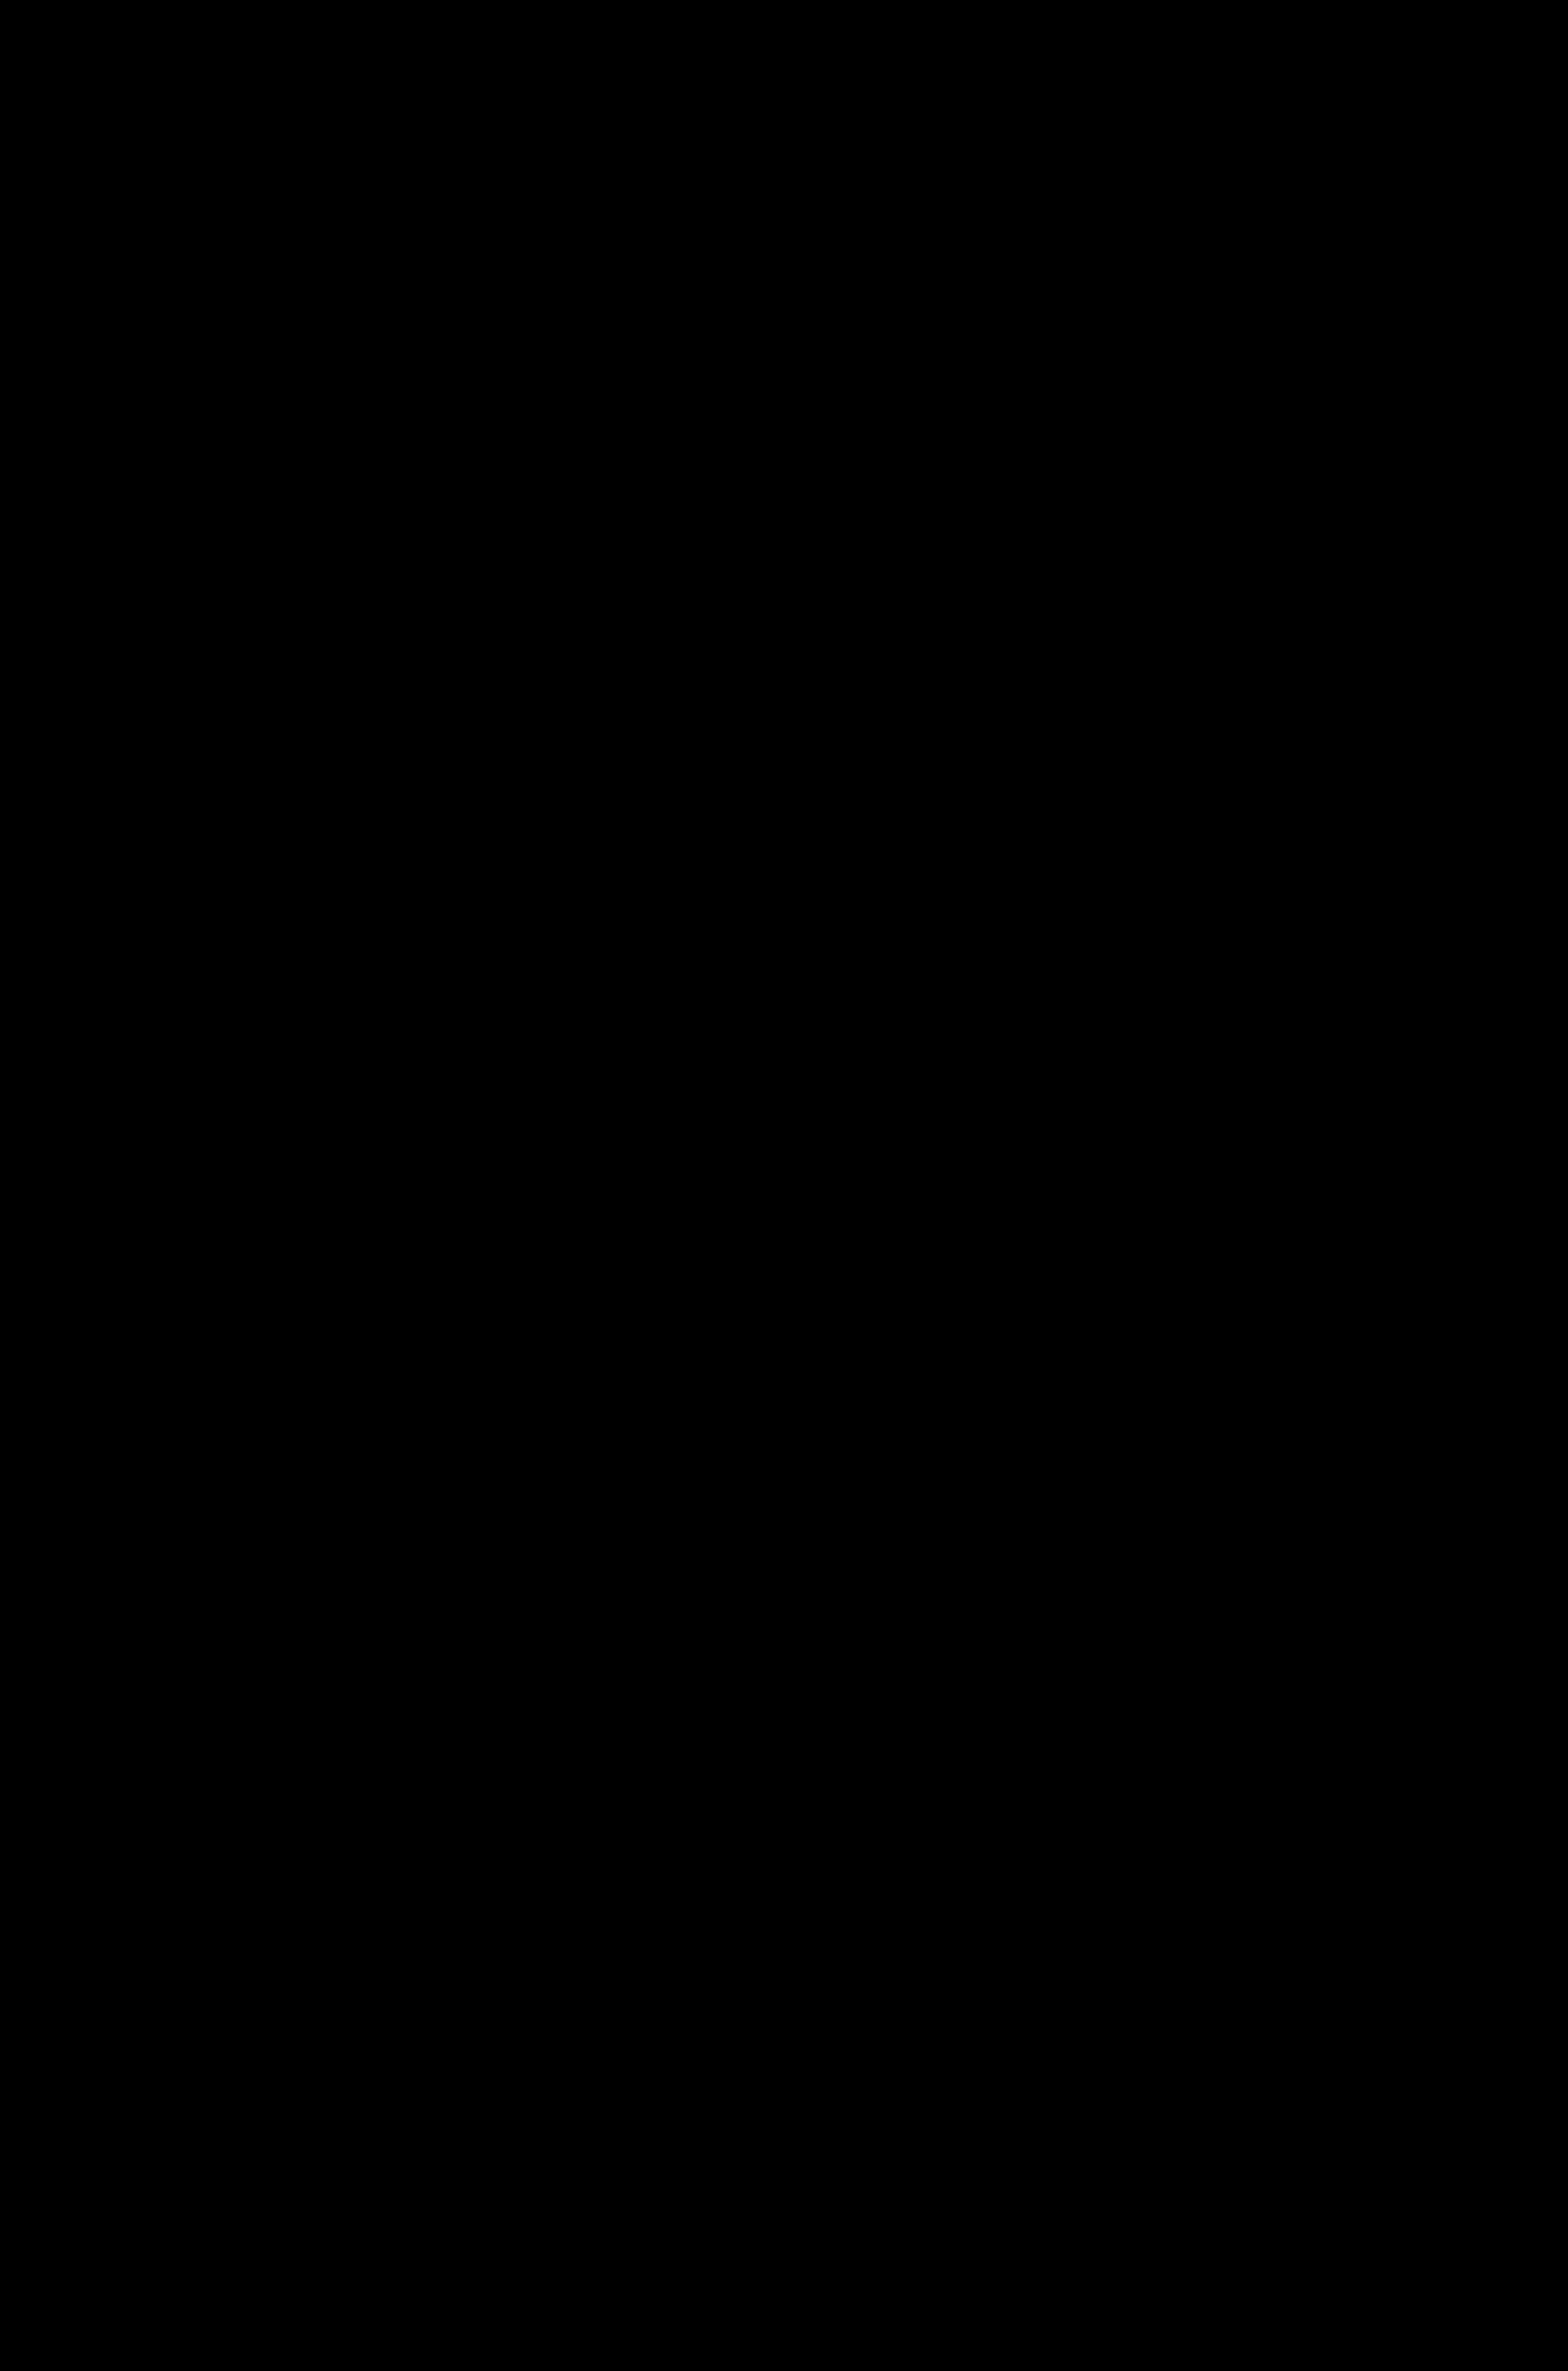 Lower case a clip art picture black and white File:Latin lowercase script a.svg - Wikimedia Commons picture black and white